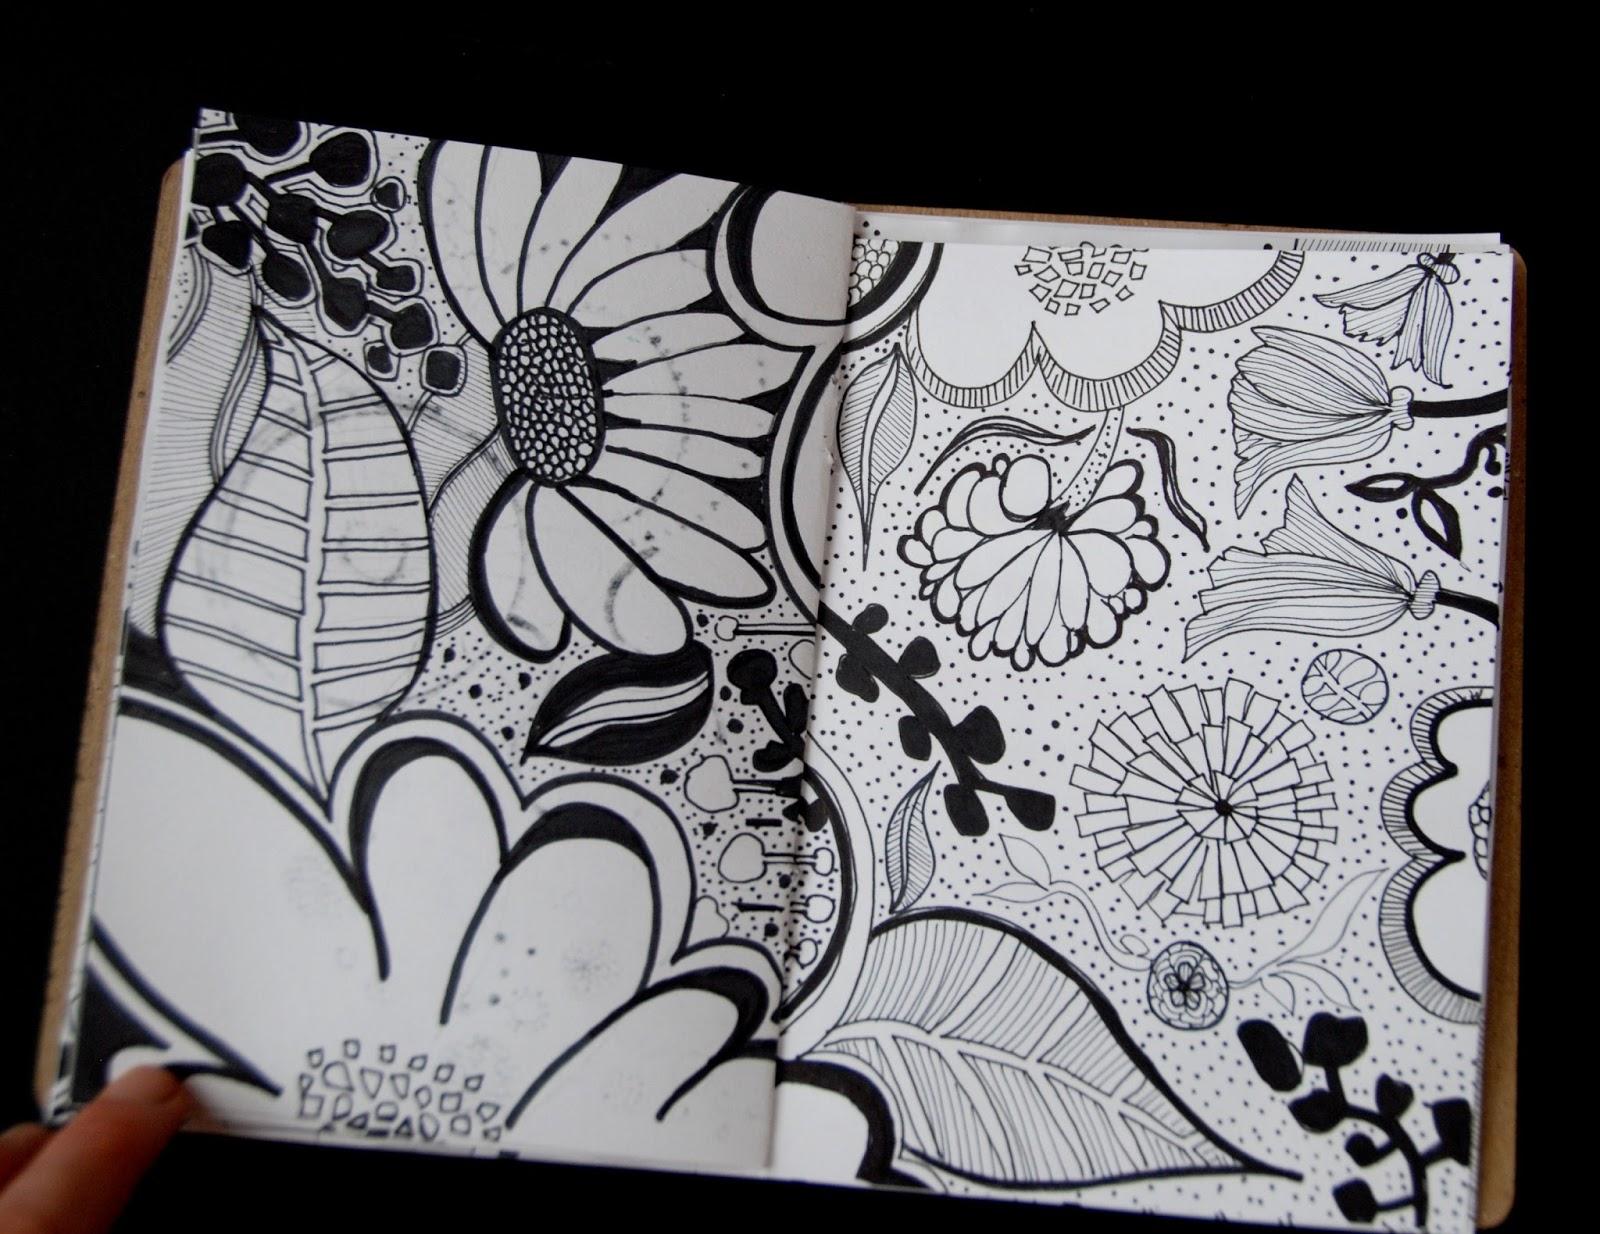 Art Sketchbook Cover Designs